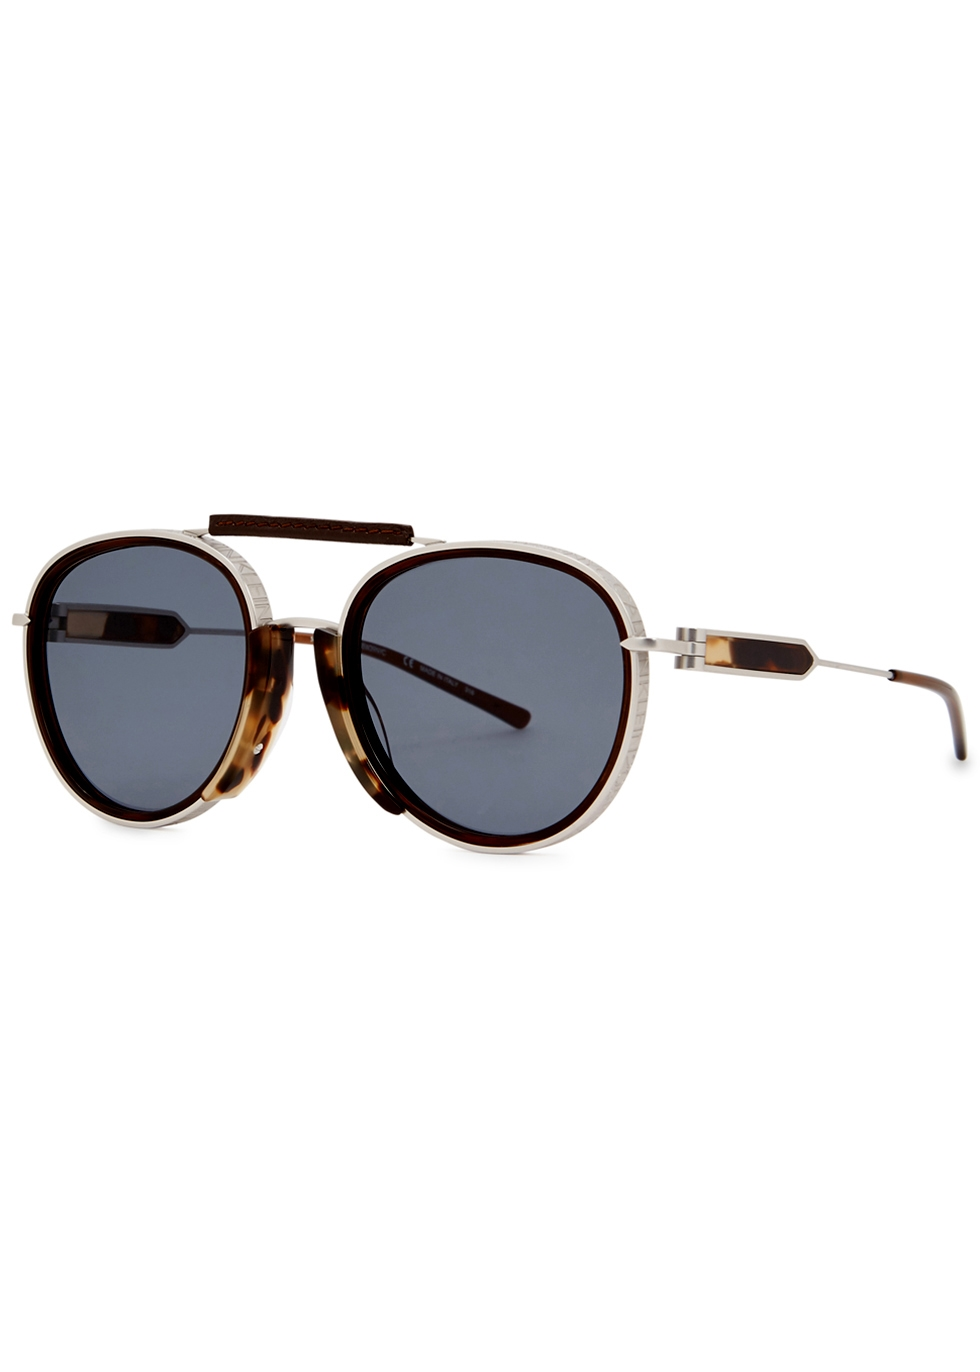 7cf9a008cb3d Men s Designer Sunglasses   Eyewear - Harvey Nichols